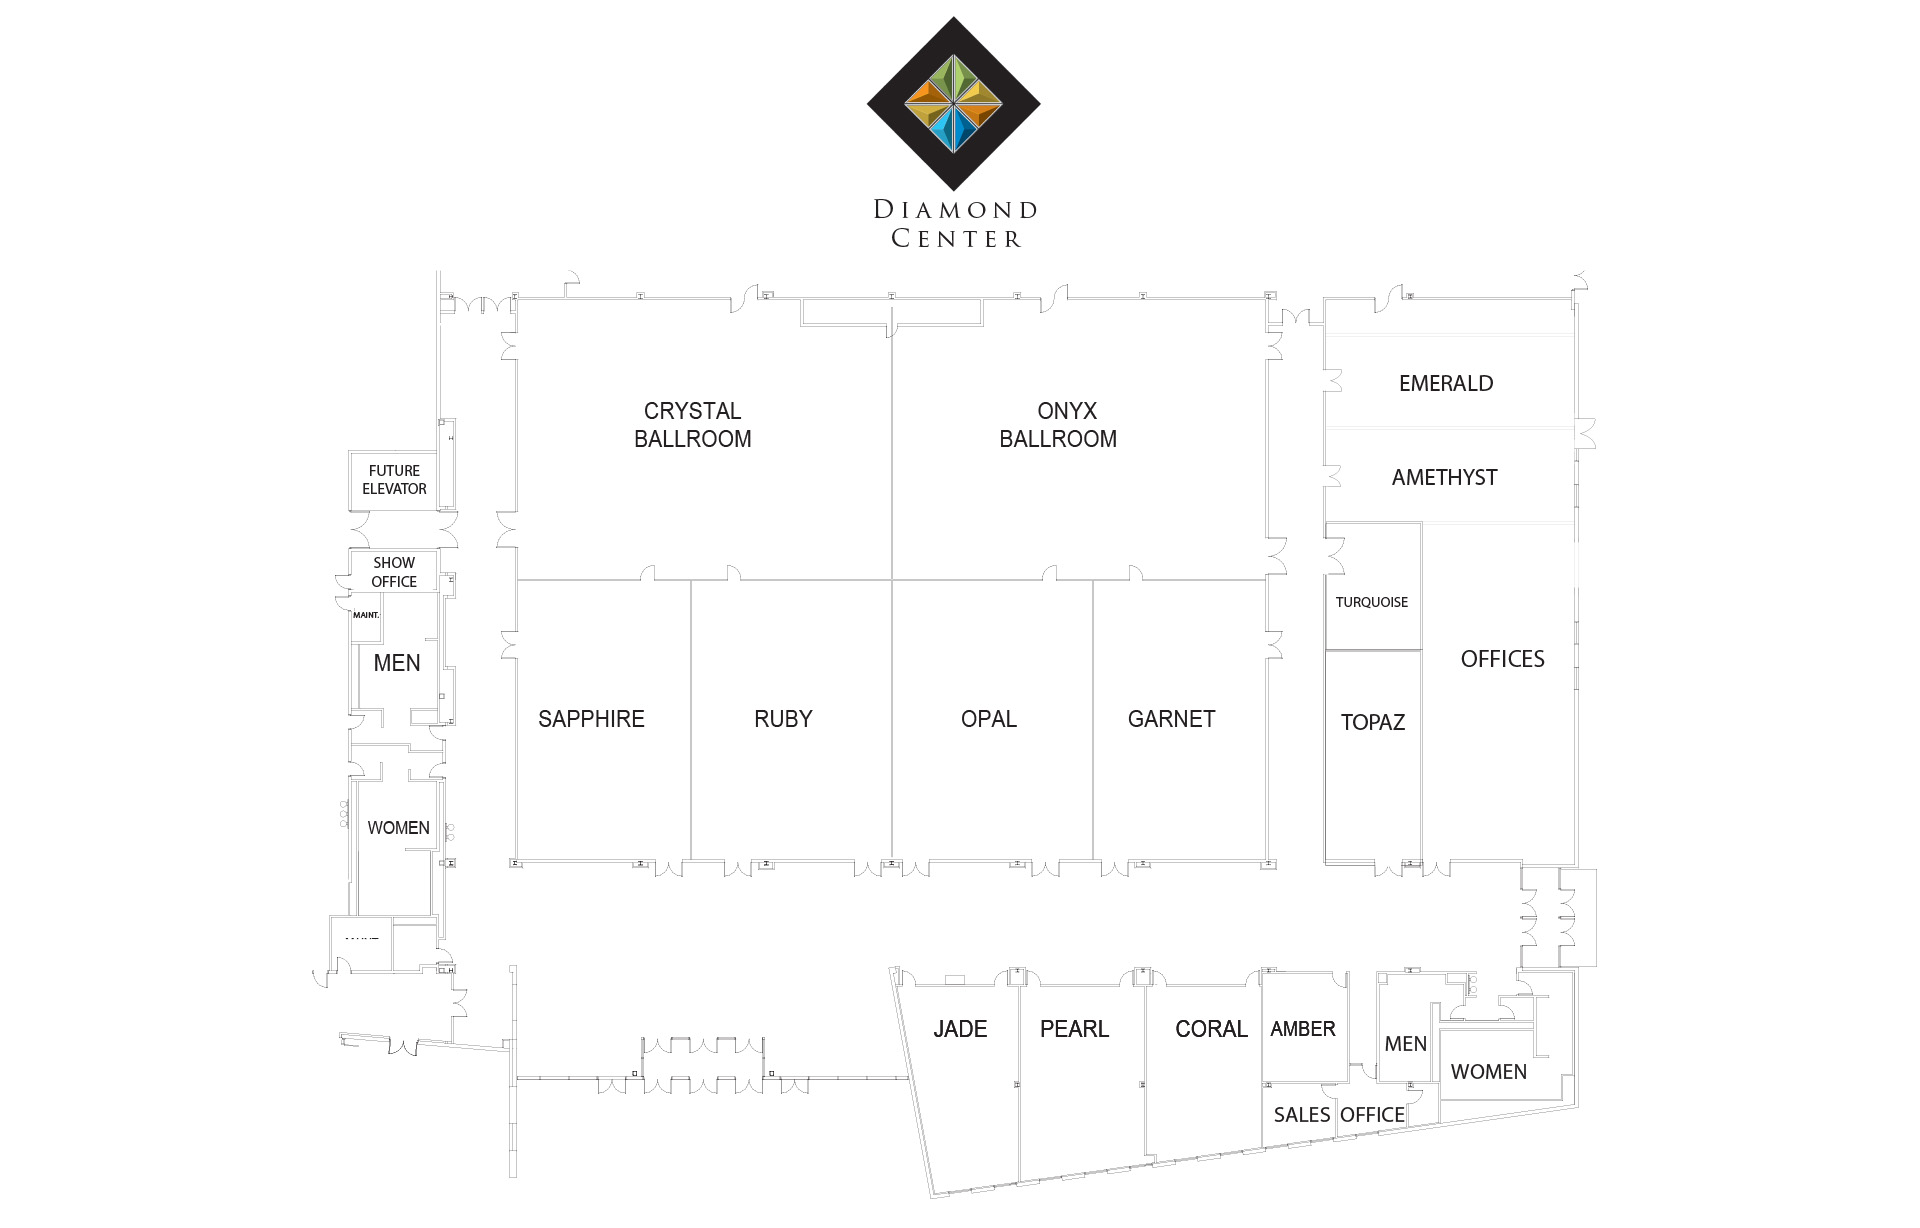 Diamond Ceter Floor Plan.jpg